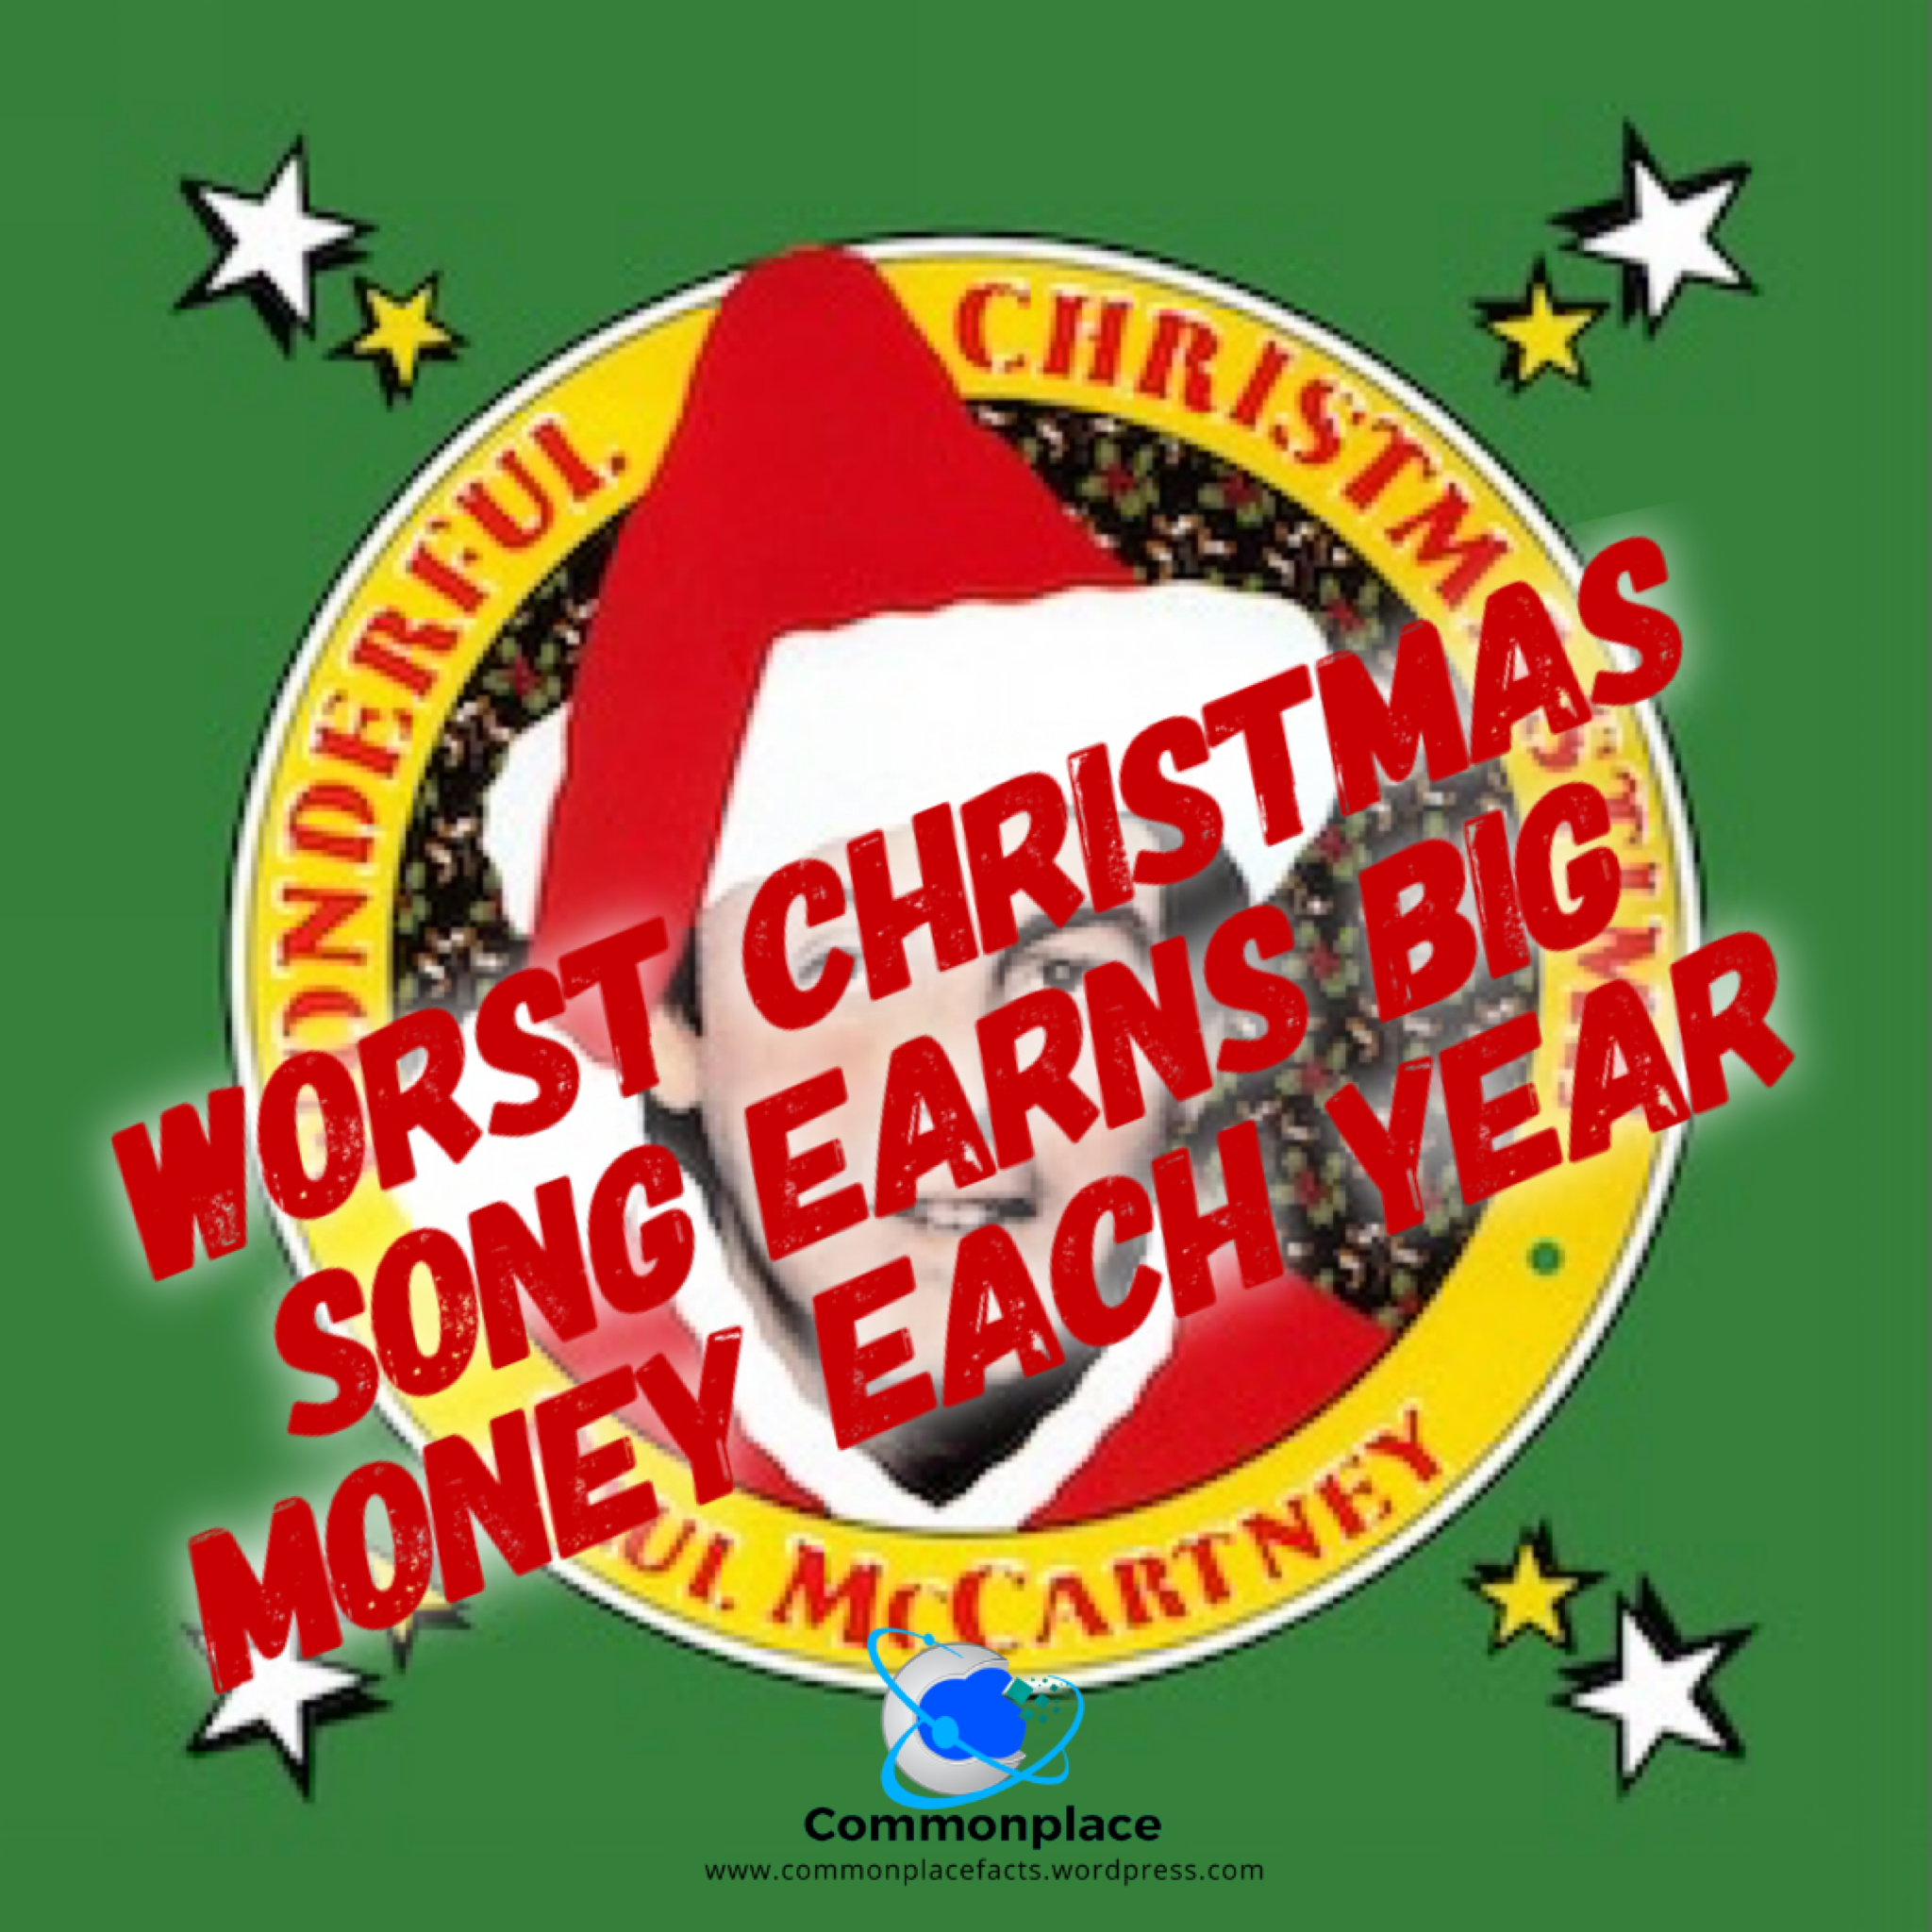 """Wonderful Christmastime"" worst Christmas song ever"